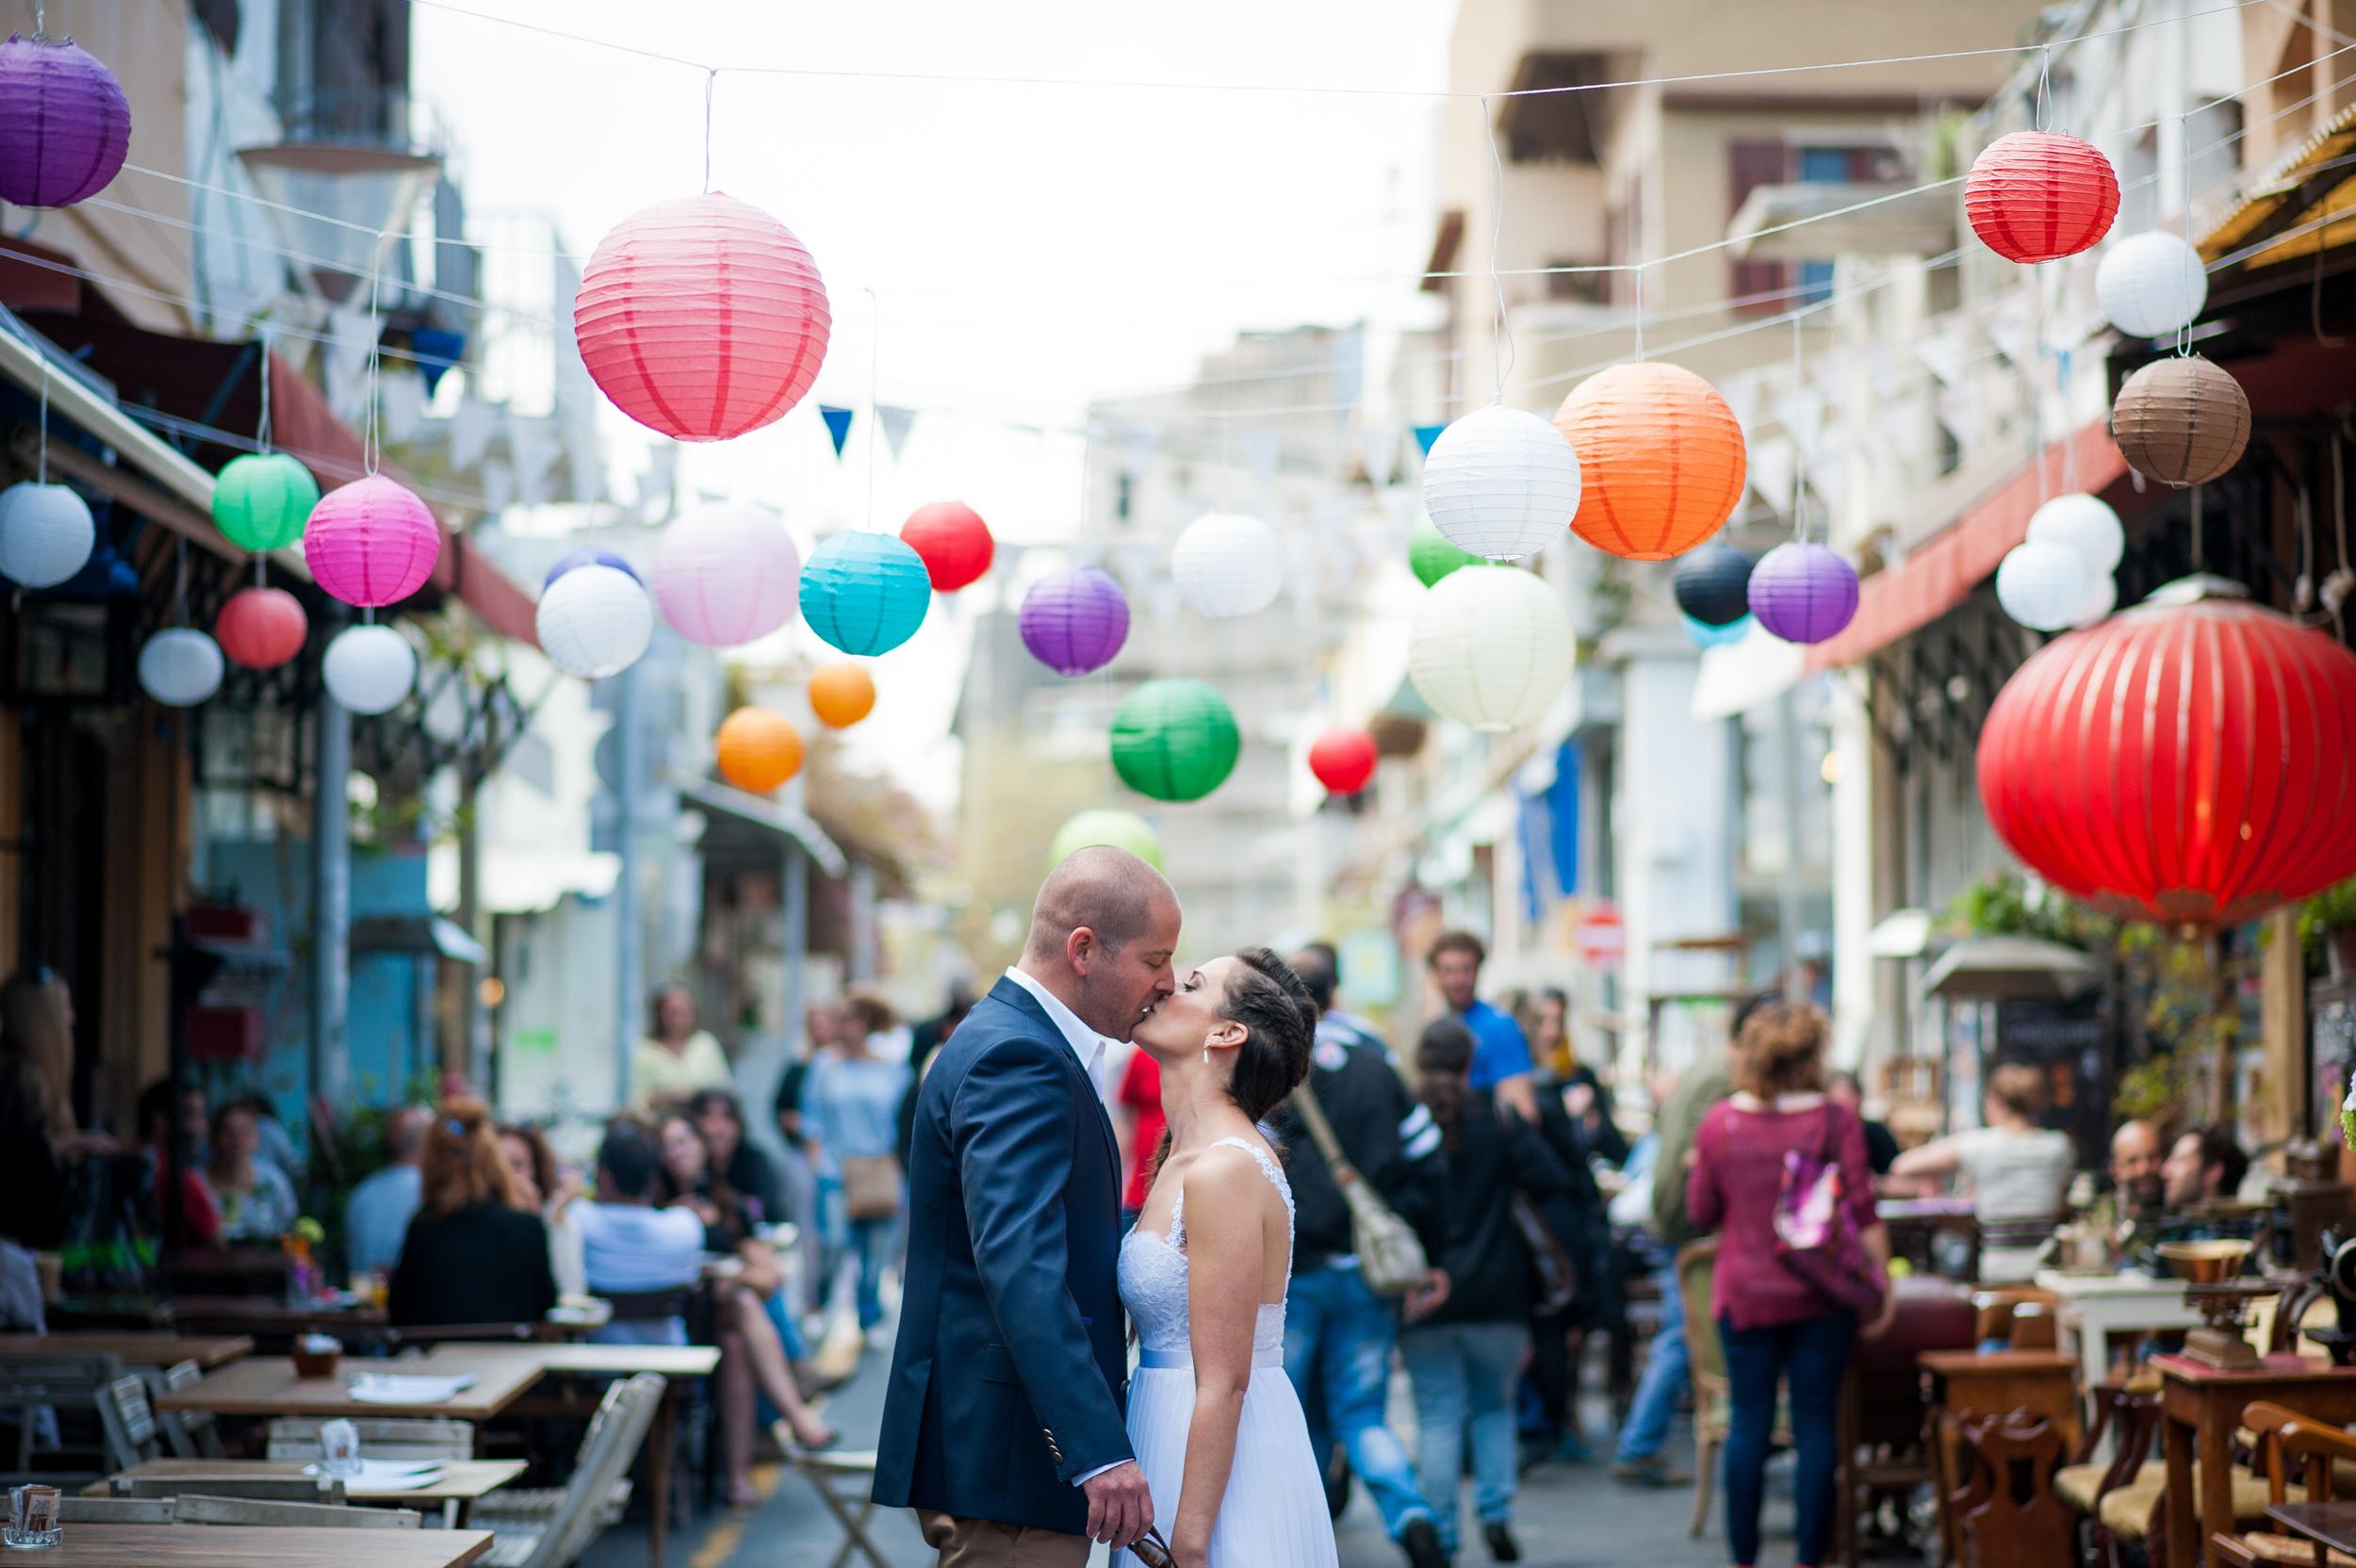 The_wedding (170).jpg